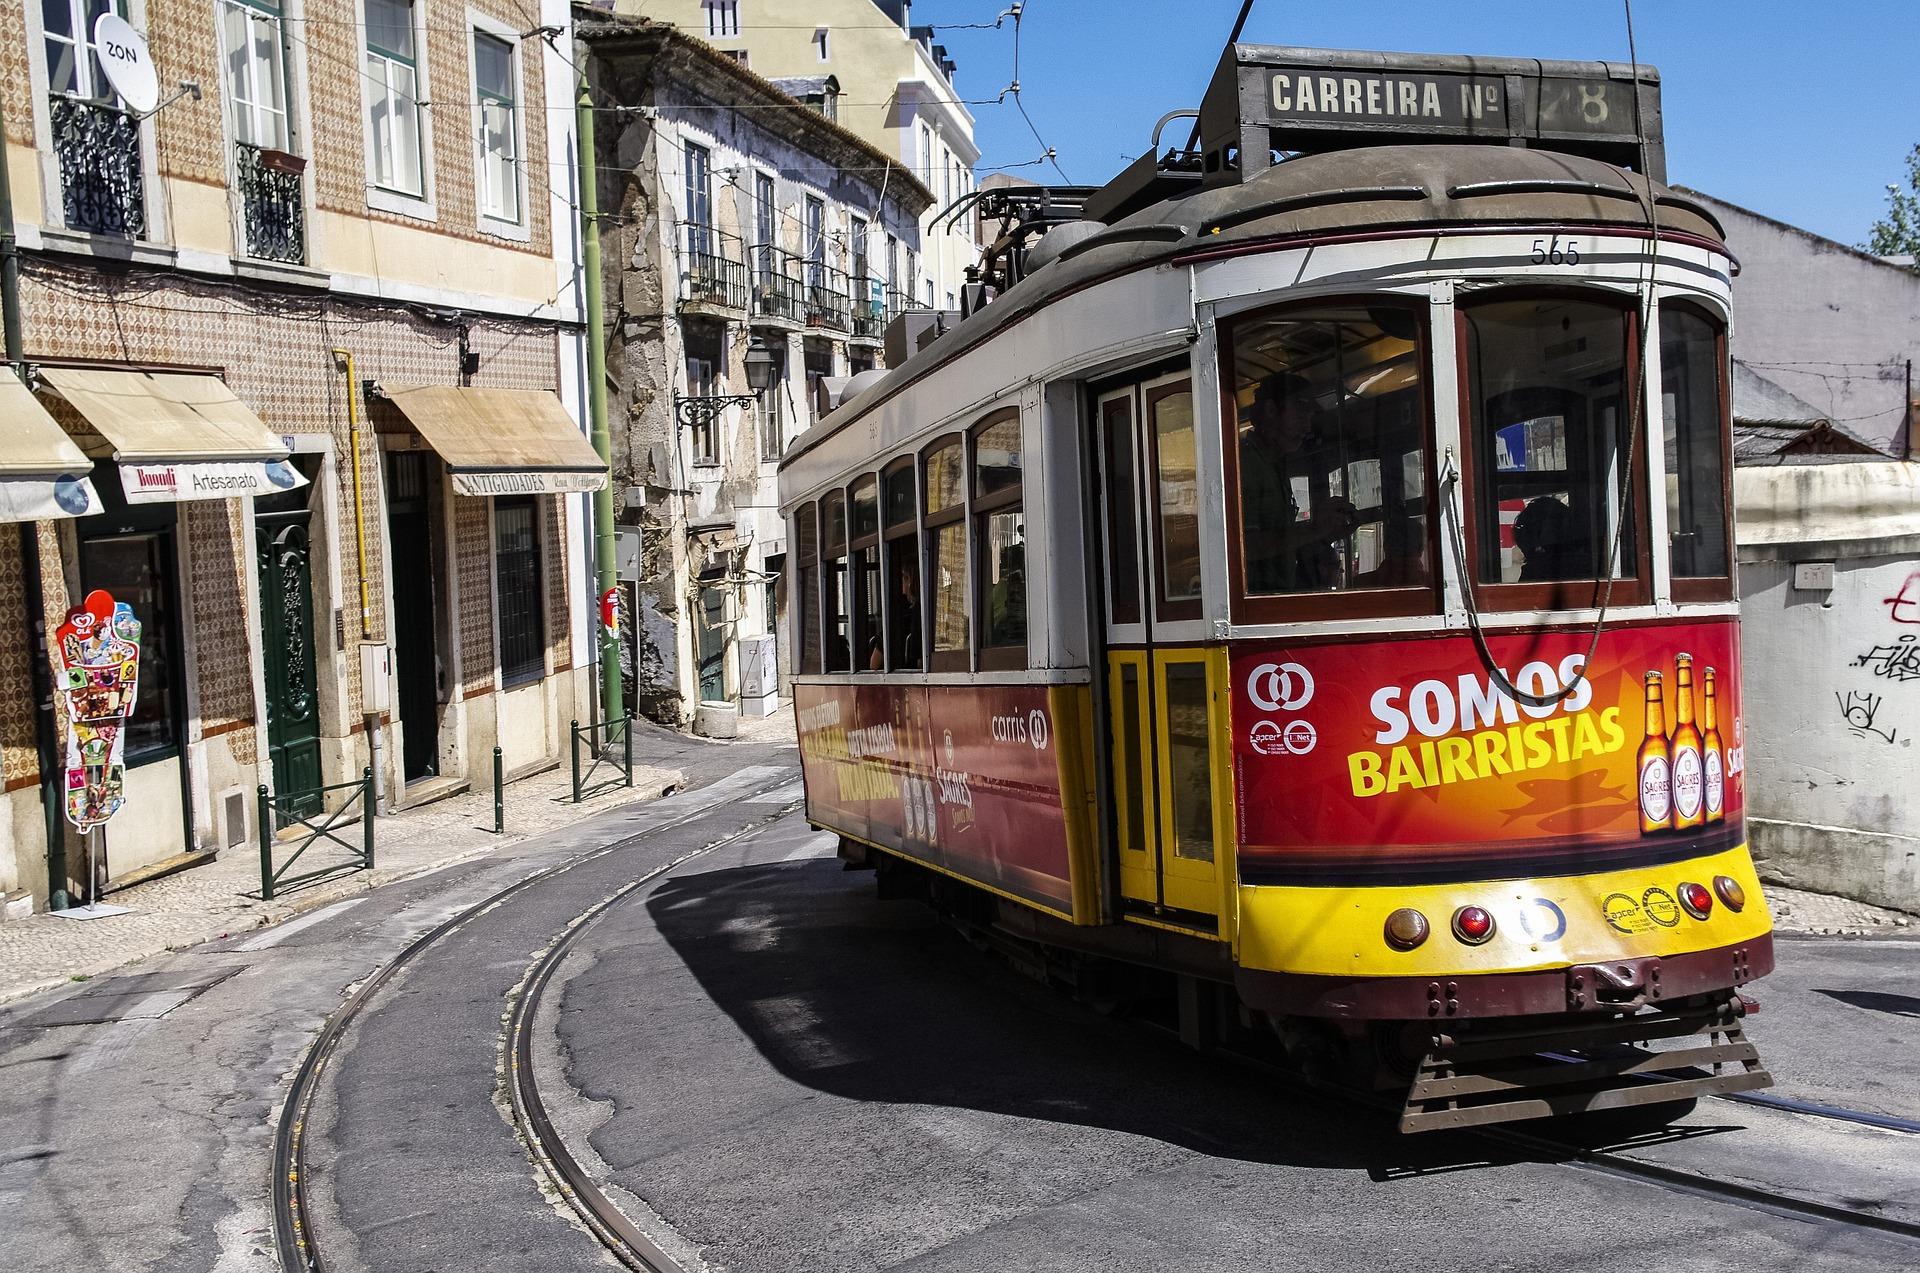 Straßenbahn in Lissabon